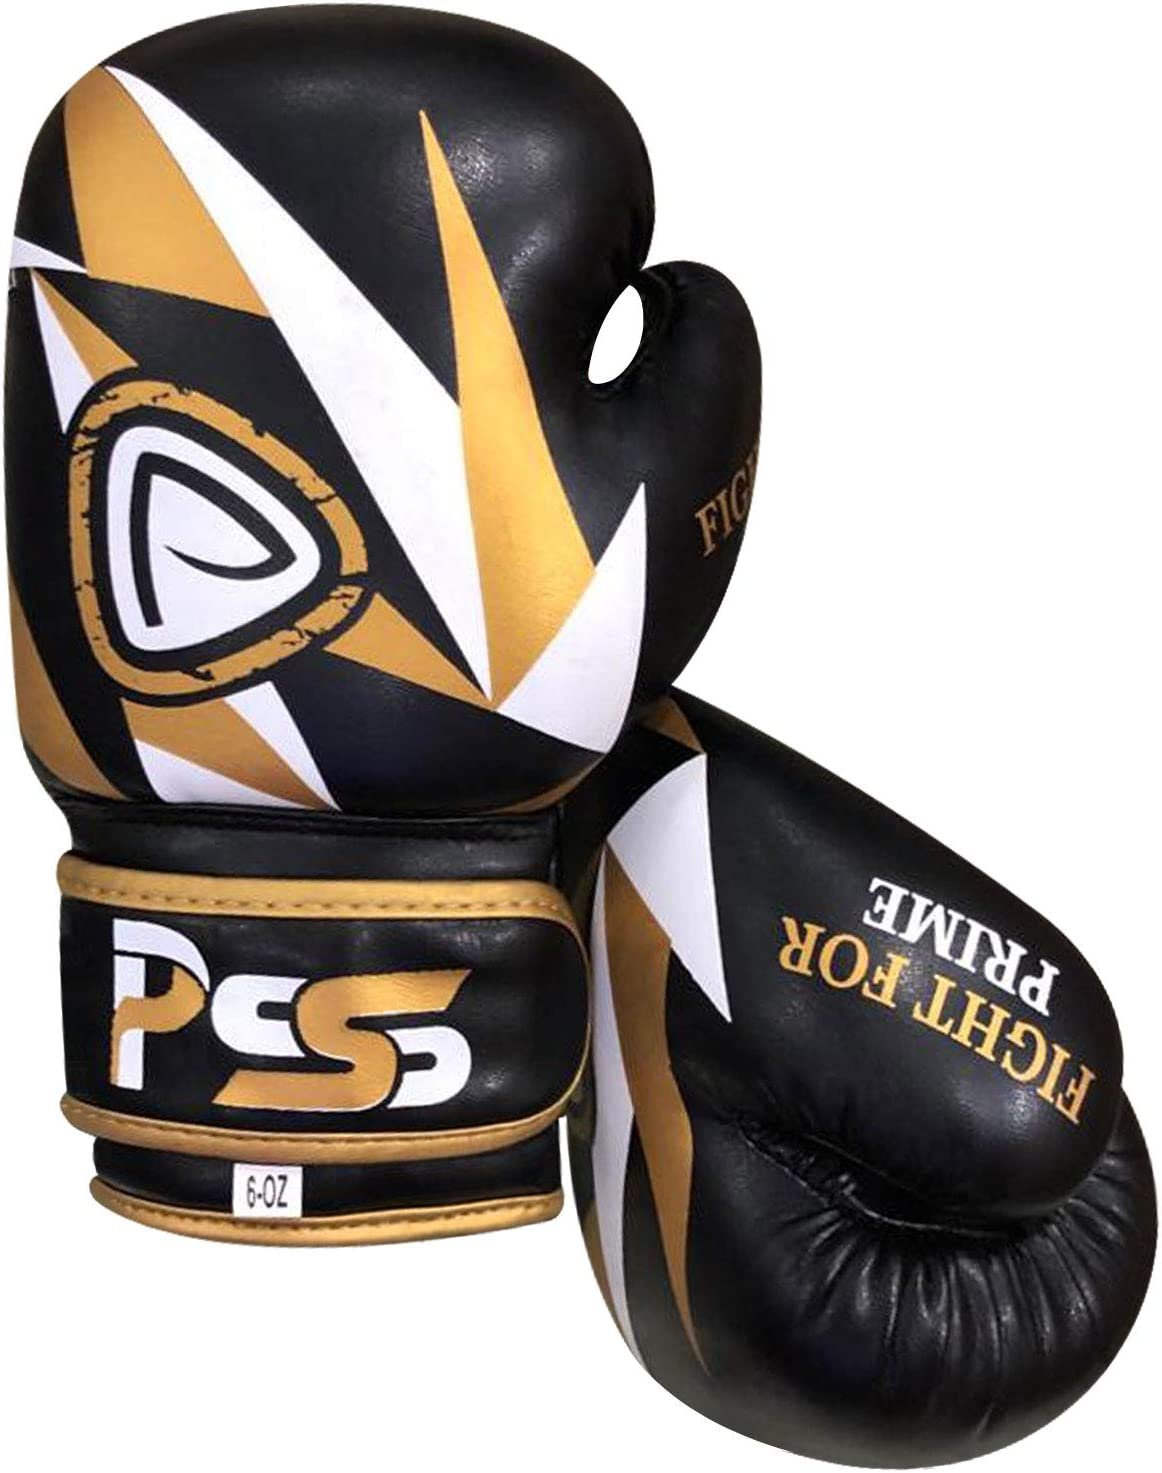 6OZ Prime Sports Shop Ultimate Kids boxing 6 pcs set uniform top /& short Boxing gloves Blue 1021 Focus Pad Blue 1109 Wrap-Rope-key chain Professional accessories kit for sparring sports